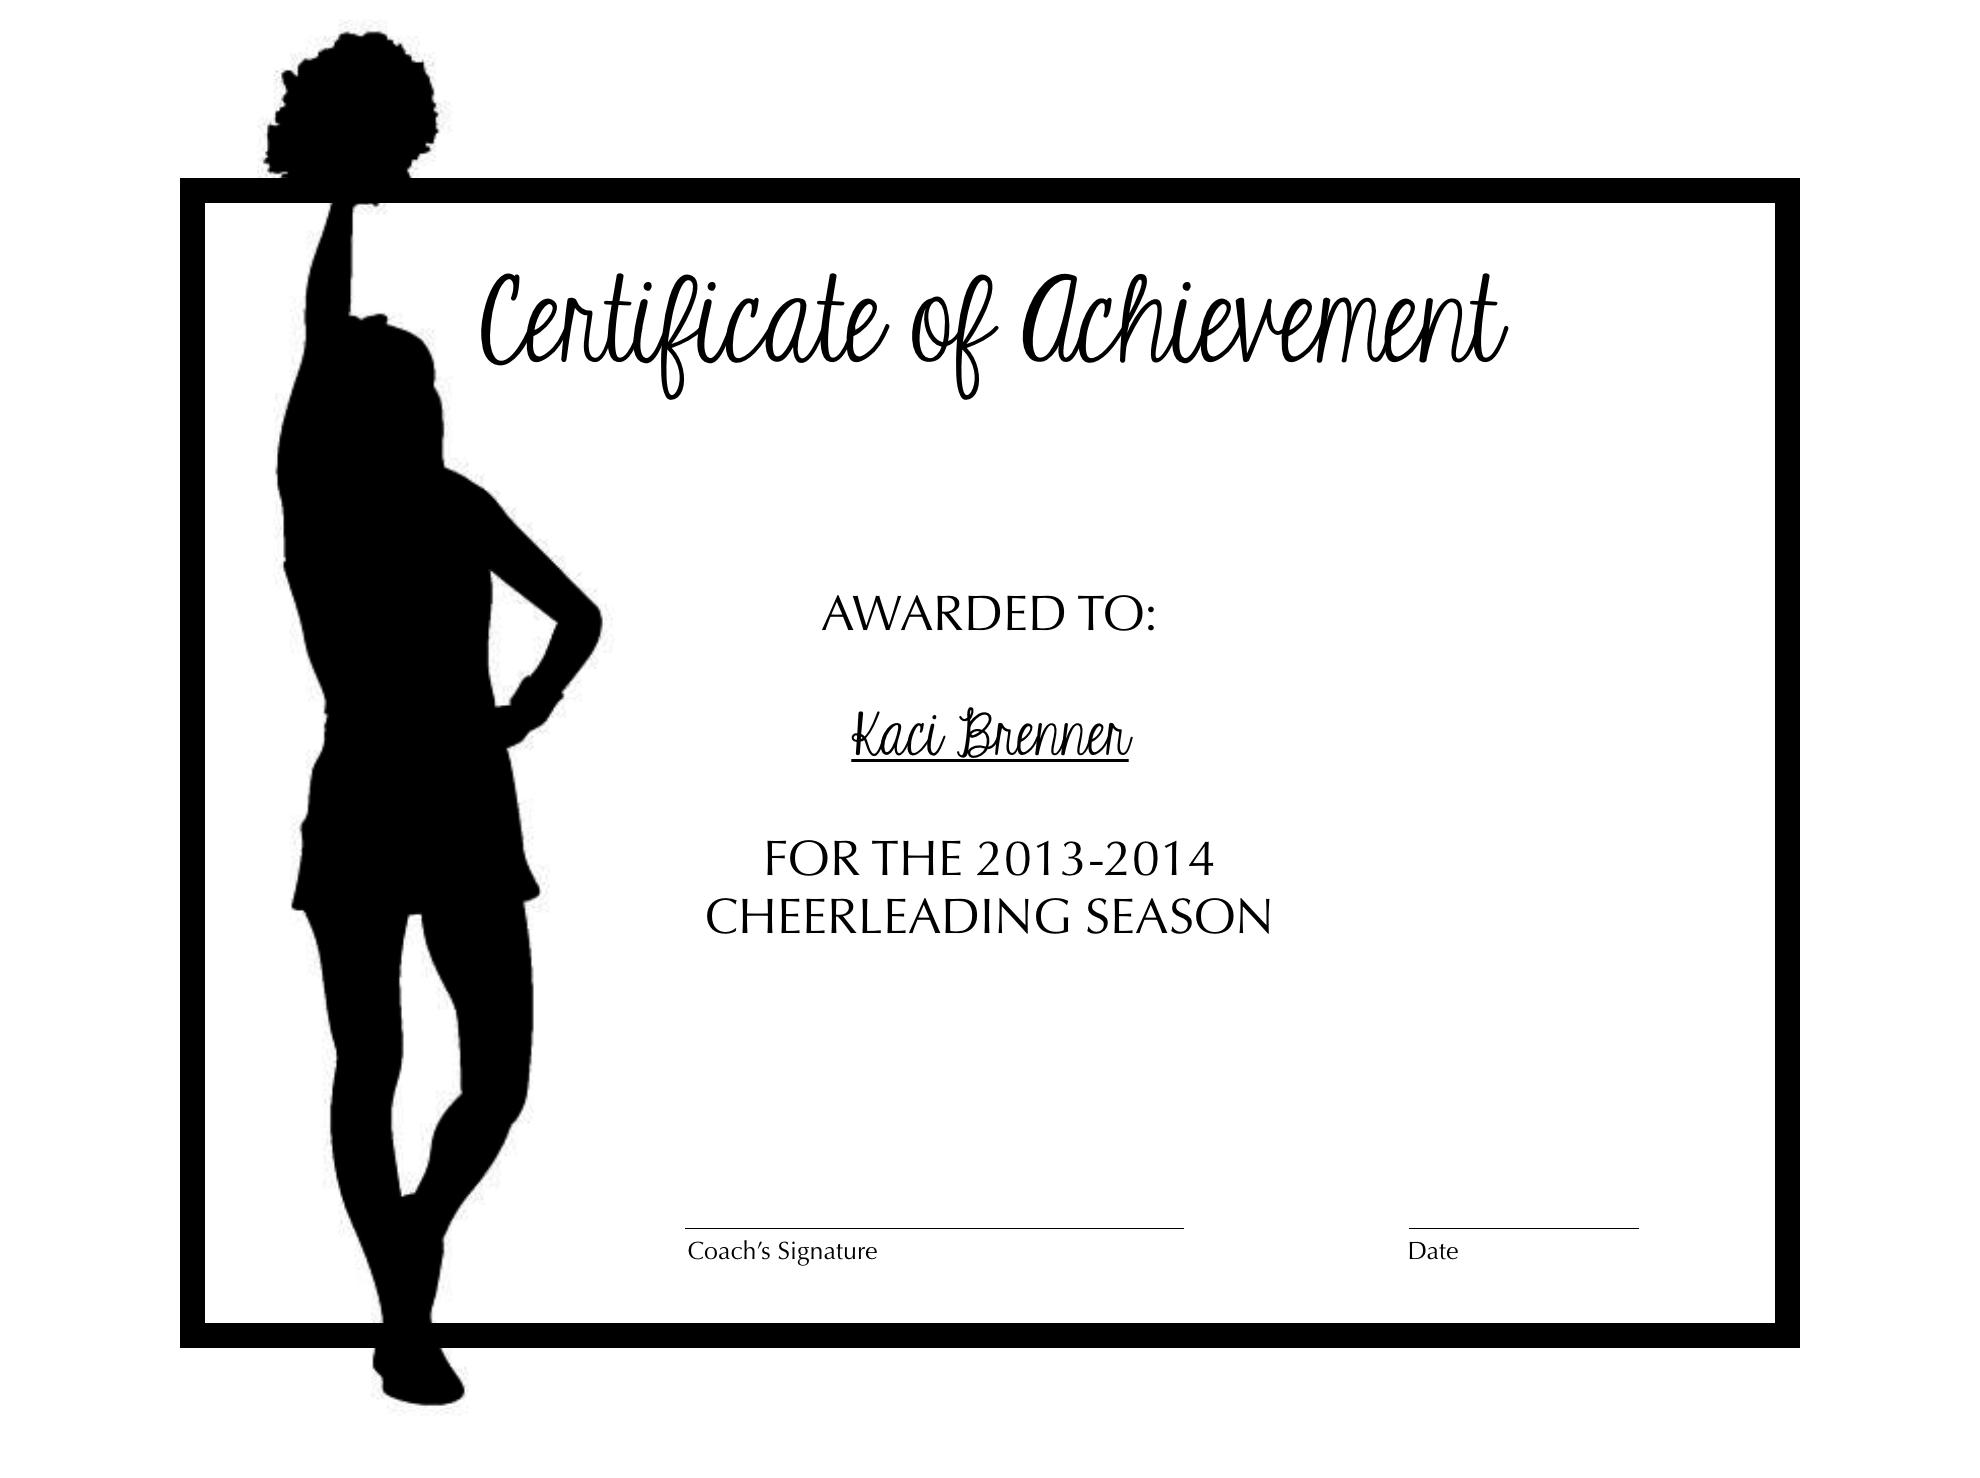 Cheerleading certificate of achievement cheer pinterest cheer cheerleading and cheer coaches for Cheer certificates